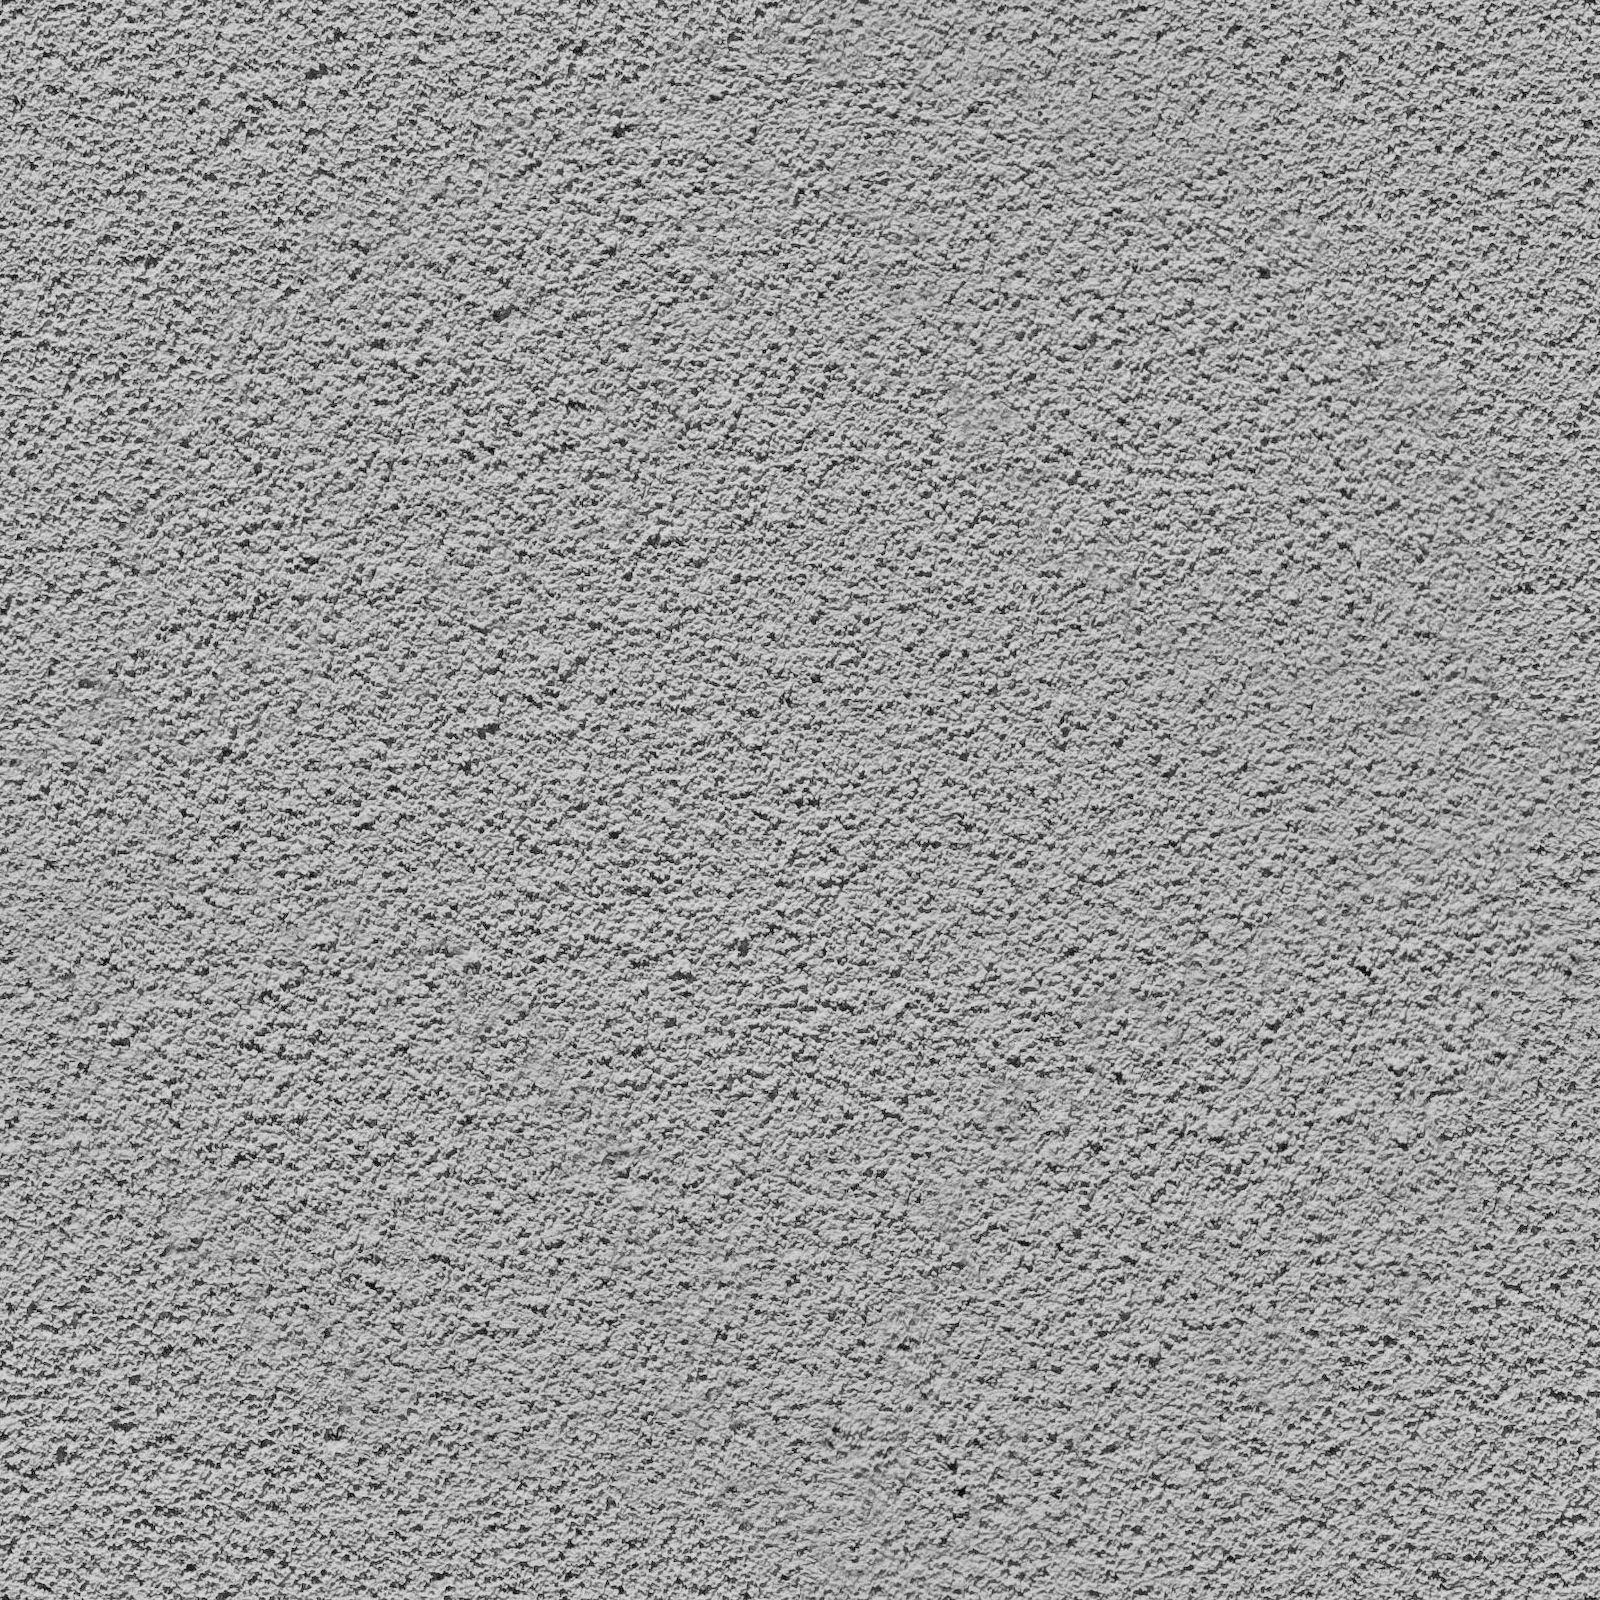 Wall paint texture seamless - High Resolution Seamless Textures Tileable Stucco Wall Texture 14